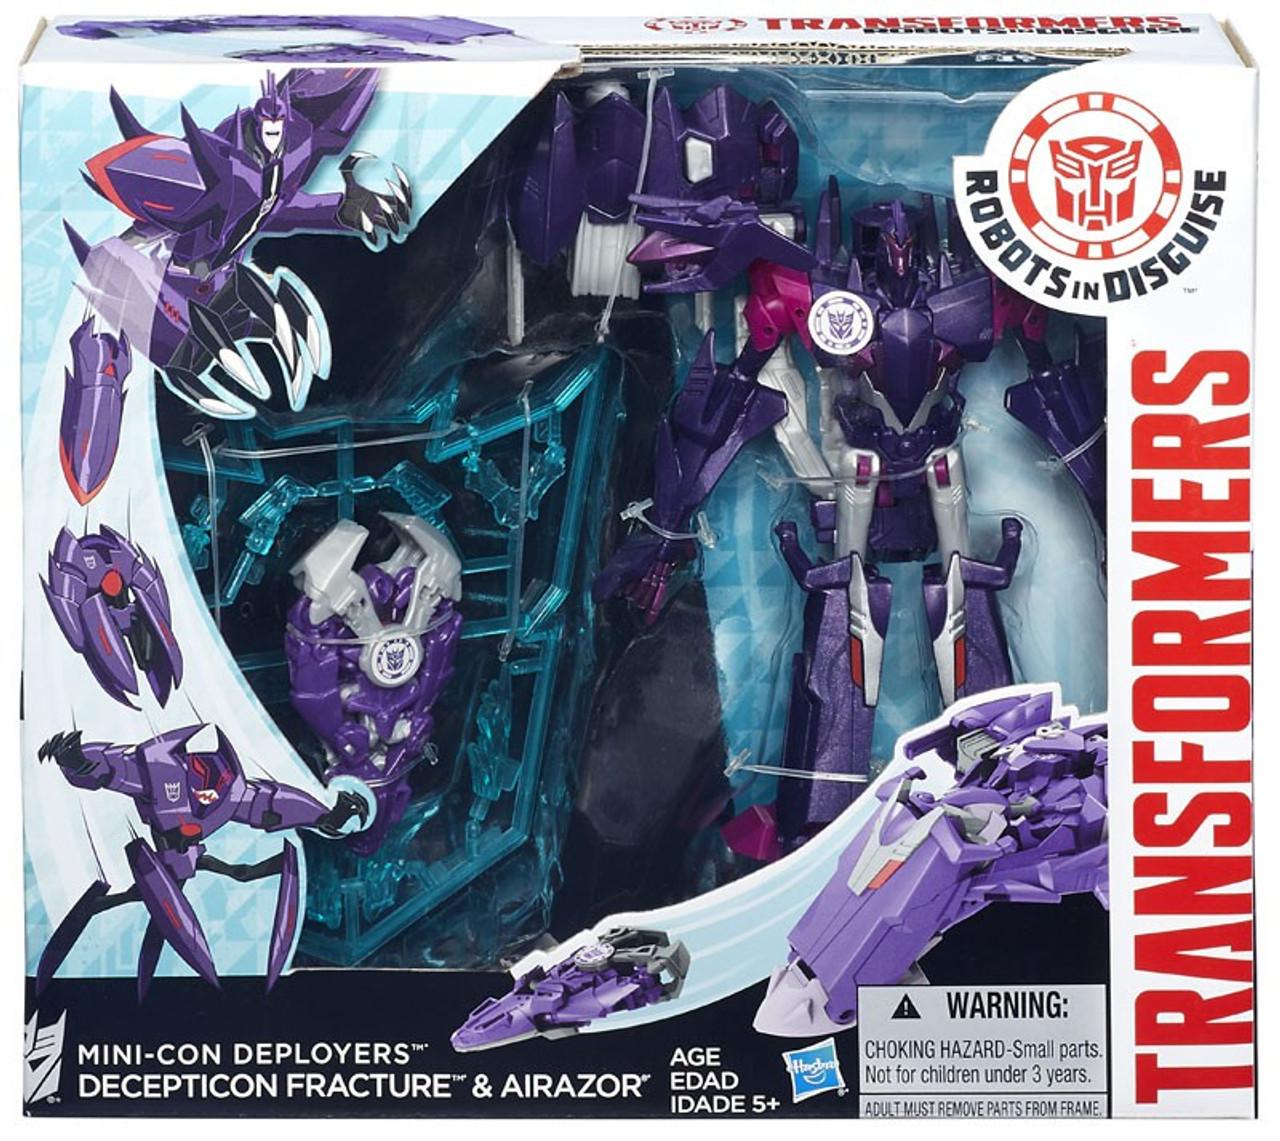 Robots Decepticon Minicon Transformers Disguise In Deployers ARjL54